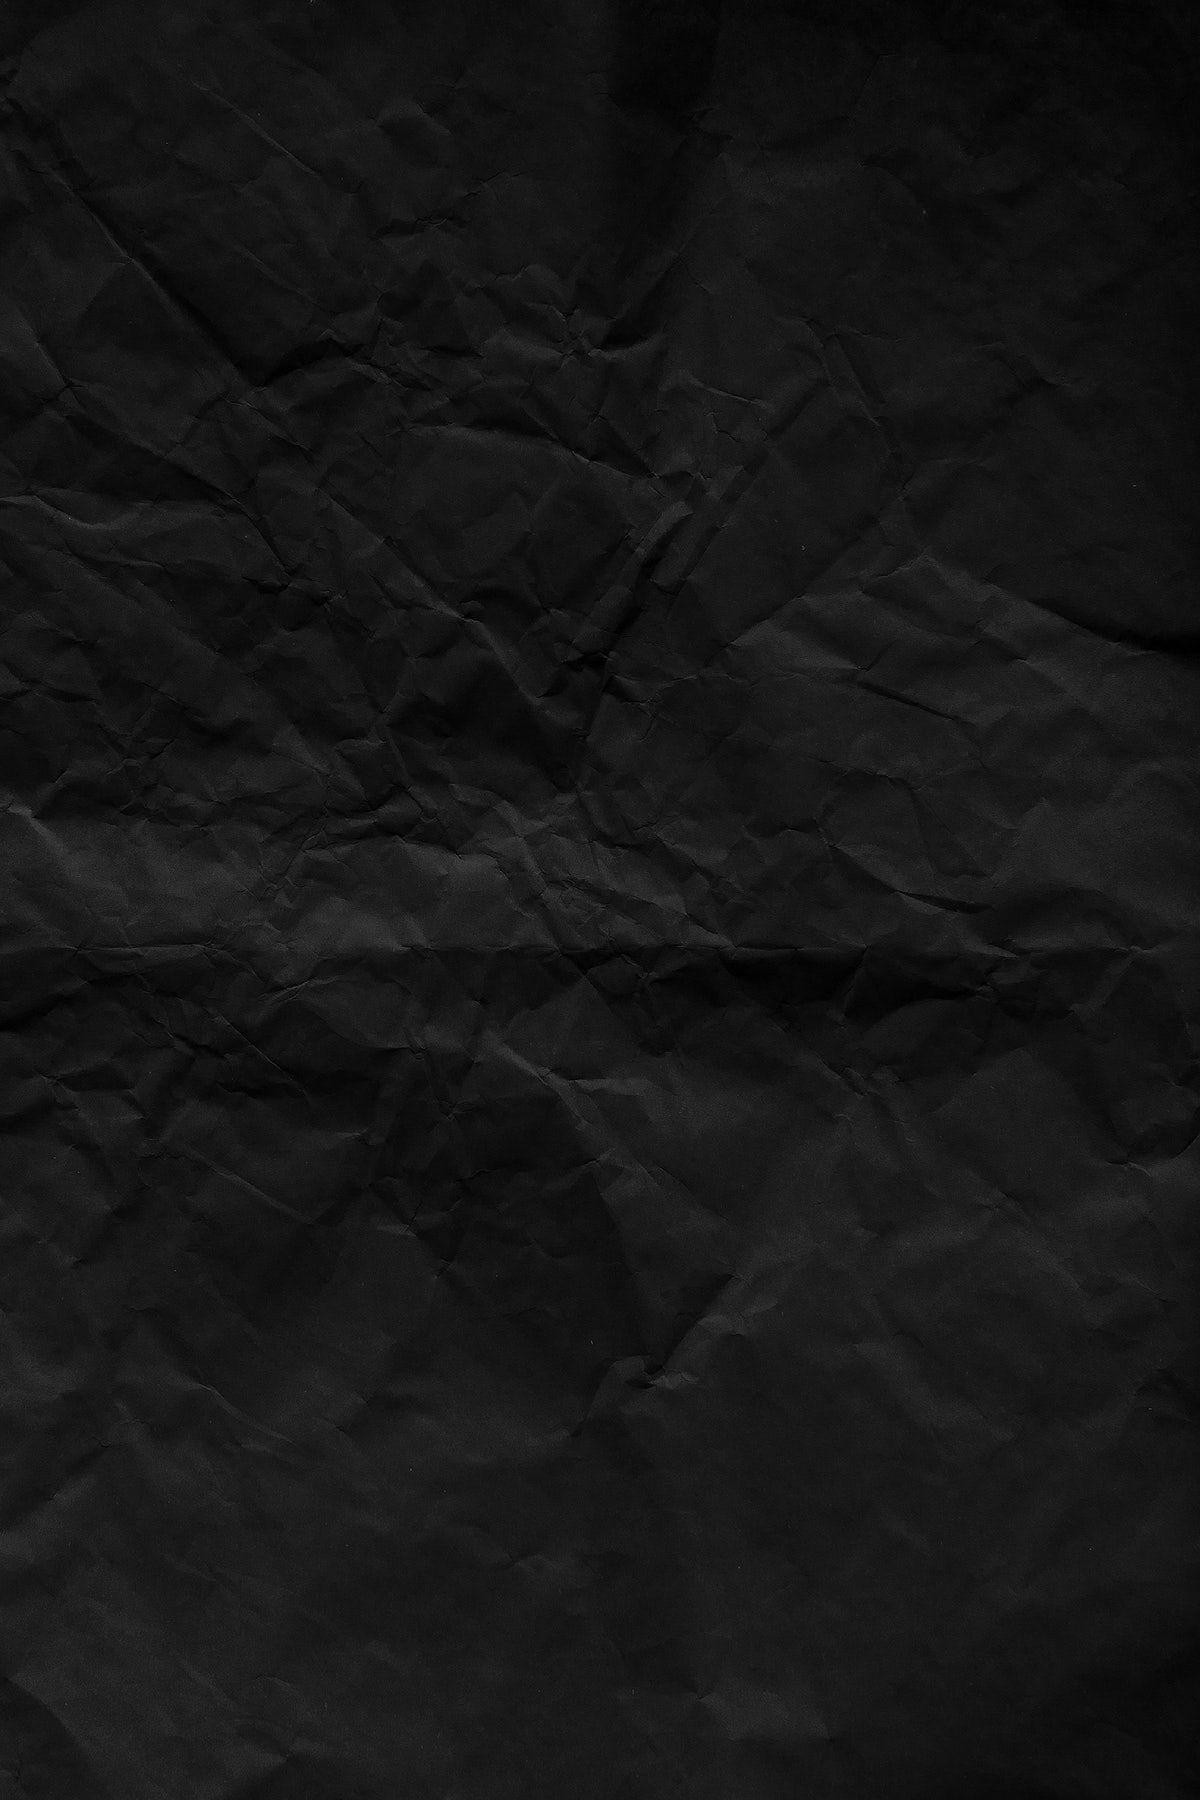 Download Premium Illustration Of Crumpled White Paper Textured Background White Paper Texture Background Paper Texture Background White Paper Texture White